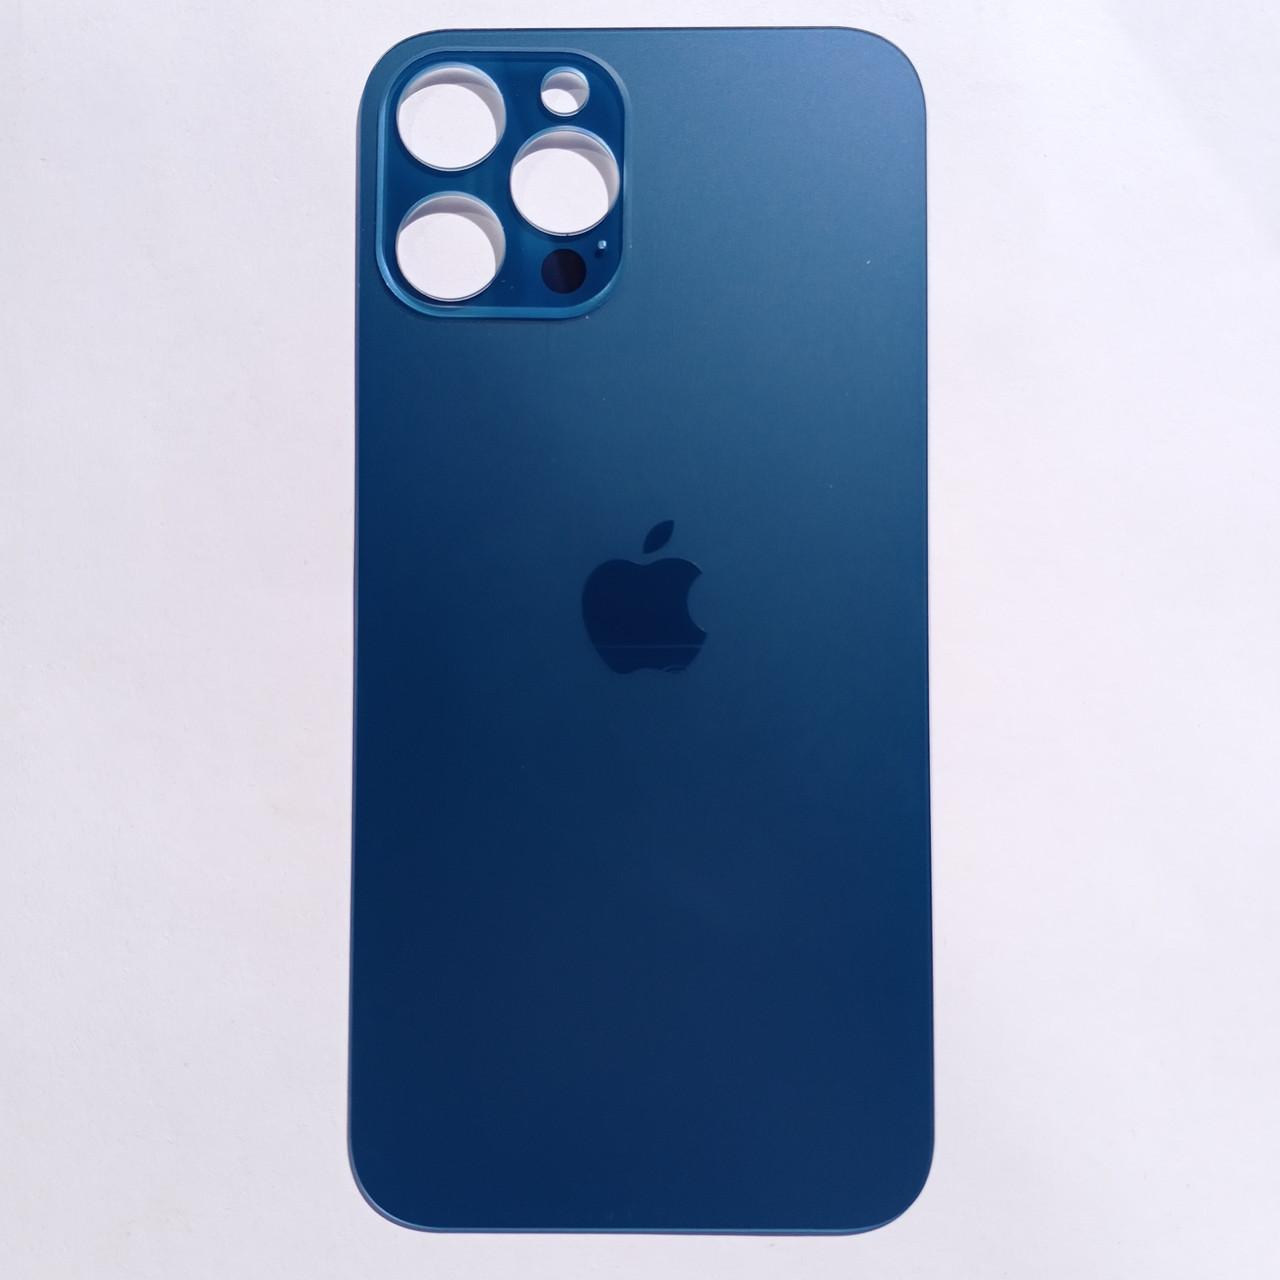 Задняя панель корпуса Novacel для Apple iPhone 12 Pro Max Pacific Blue Big Hole